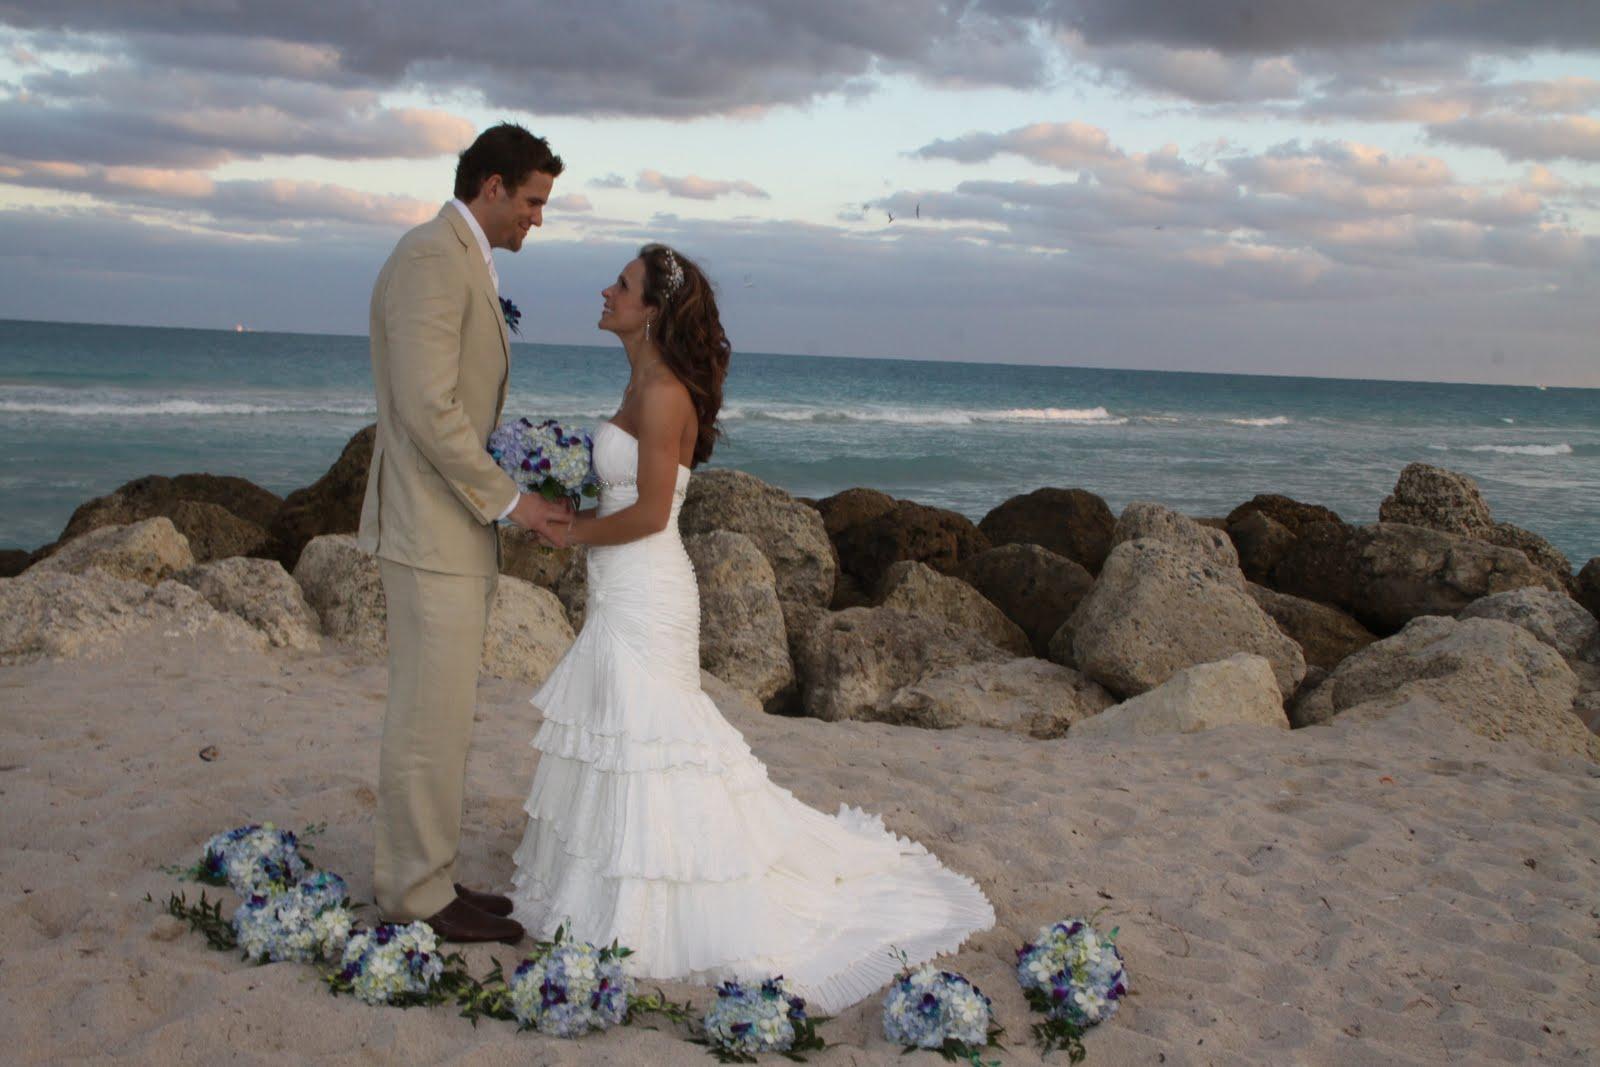 Affordable Beach Weddings! 305-793-4387: Melissa & Scott